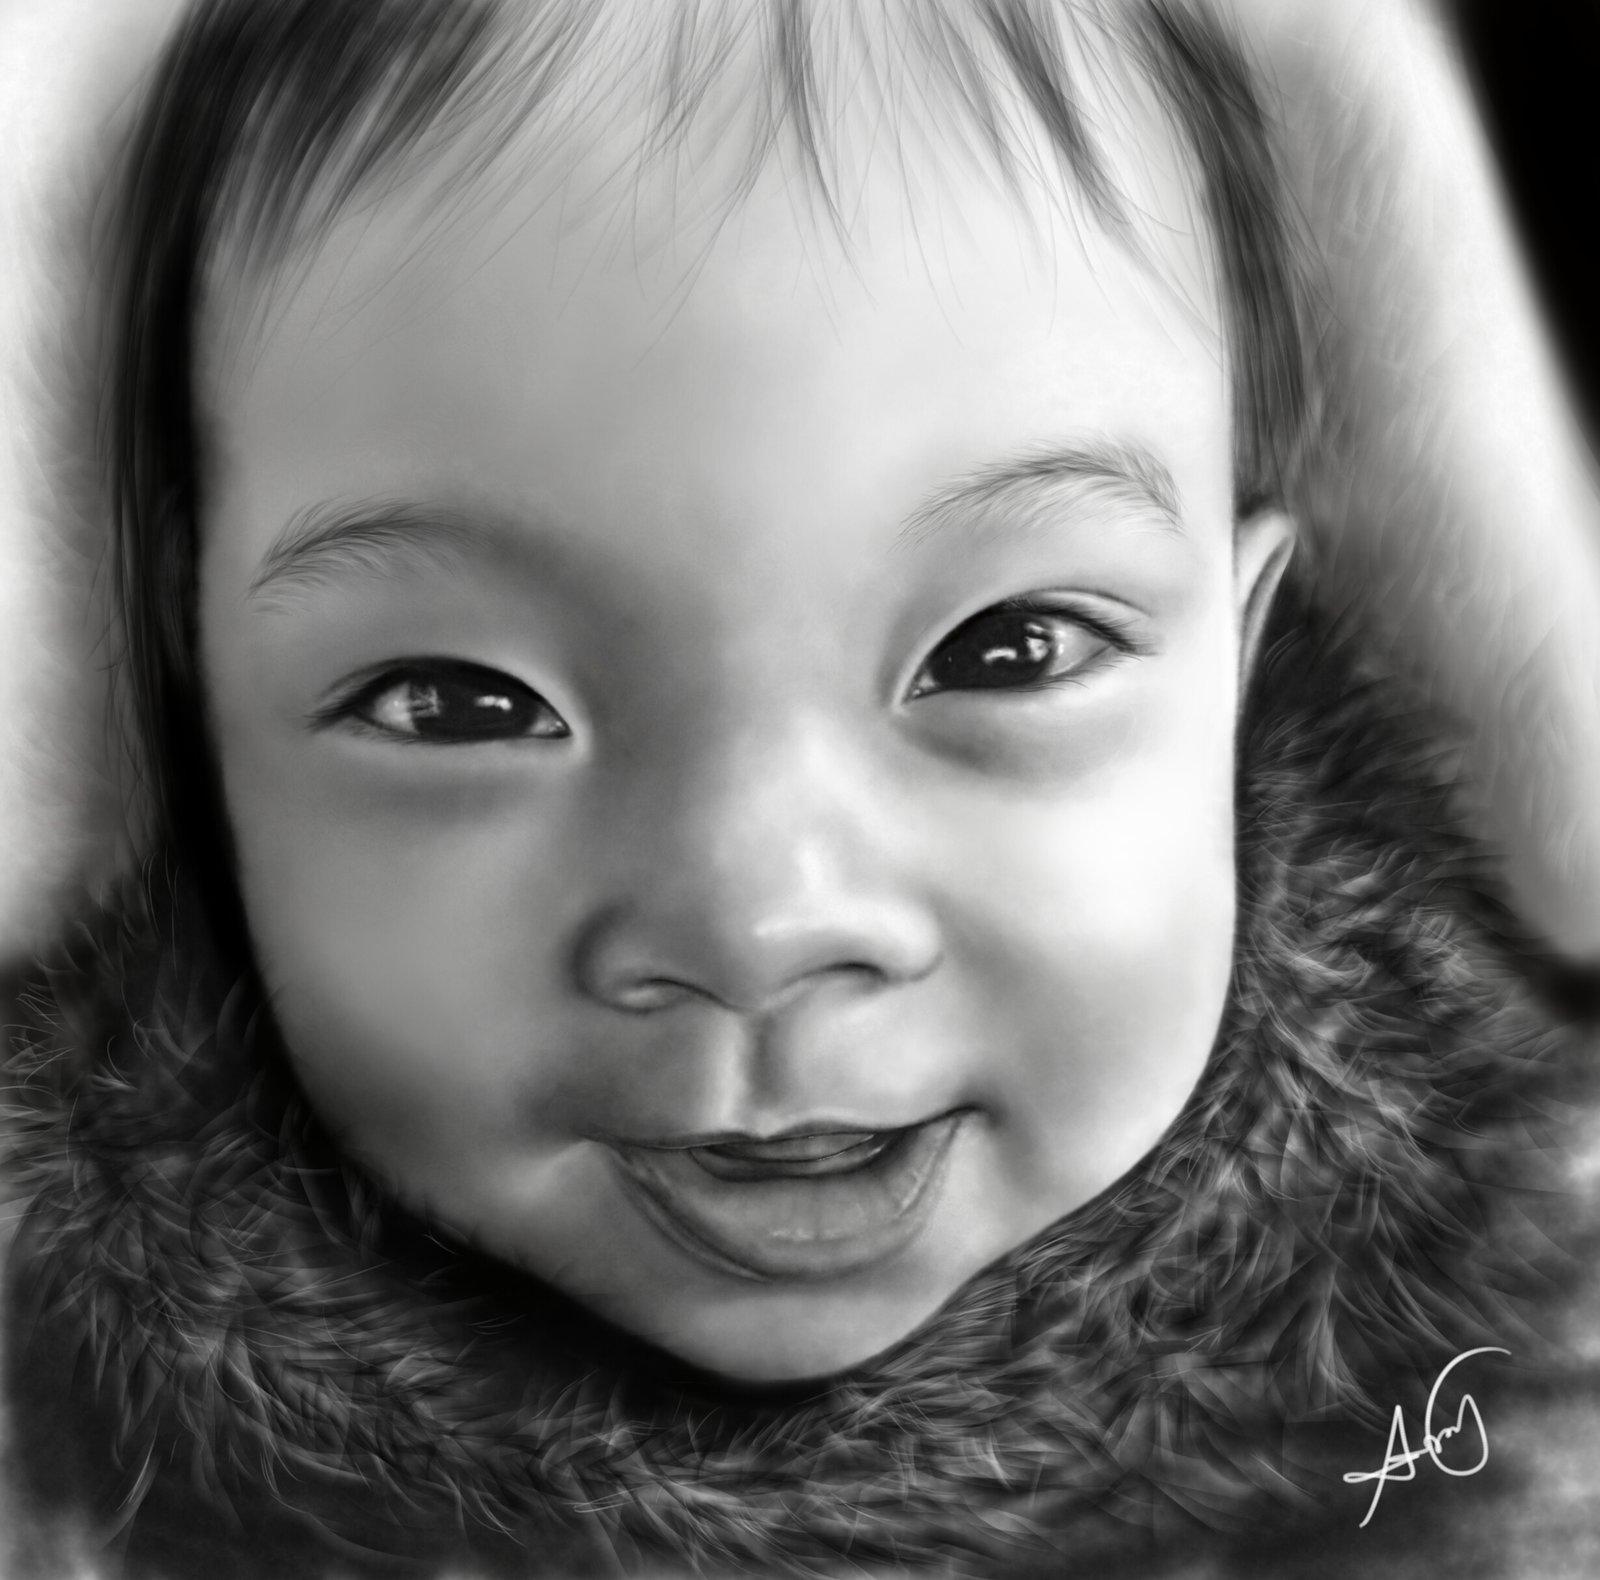 Drawn portrait digital Drawing Baby by DeviantArt Drawing